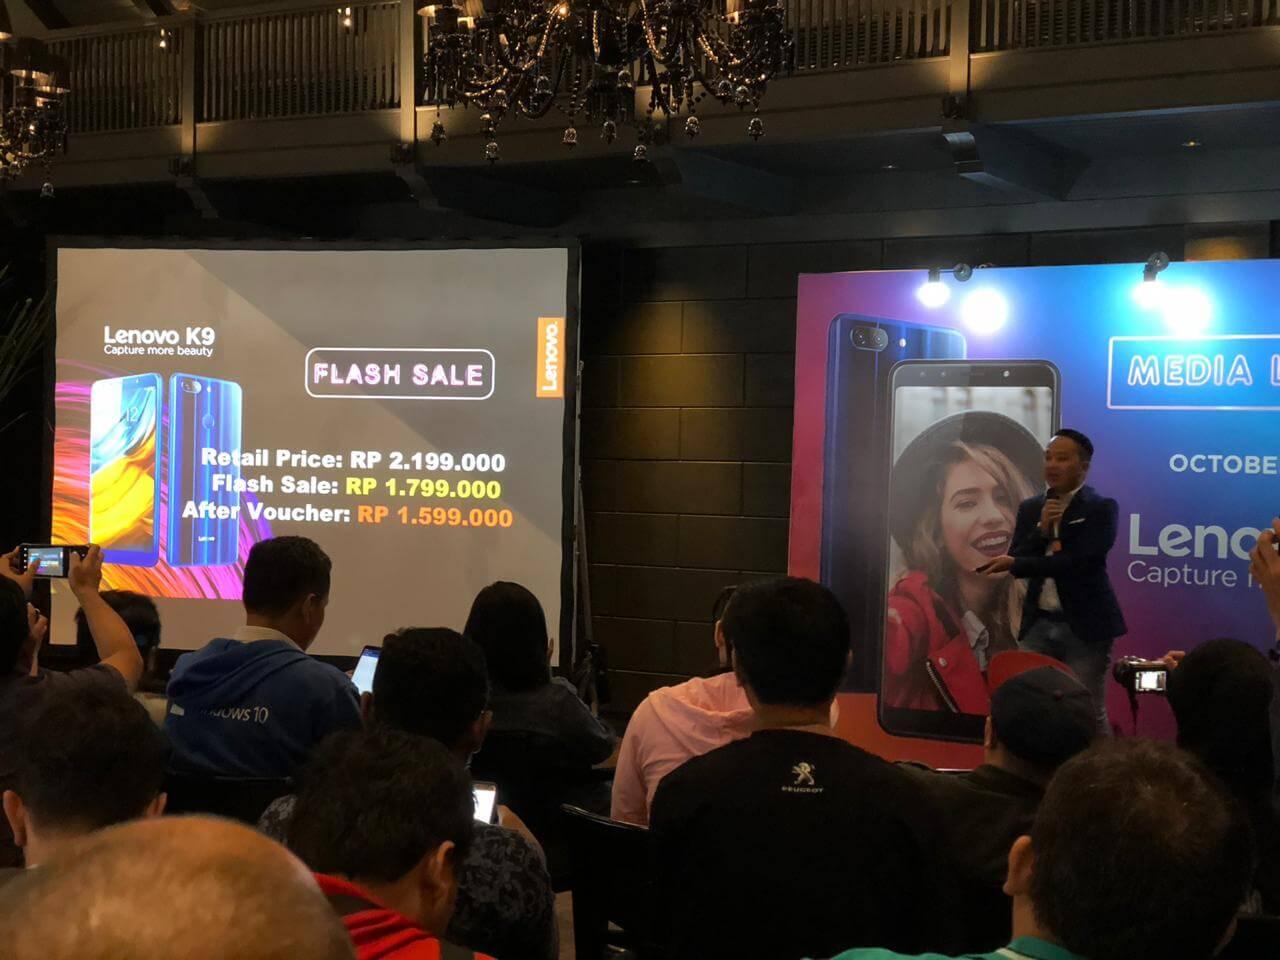 launching hp android lenovo k9 terbaru 2018, lenovo k9 terbaru oktober 2019, harga dan spesifikasi lengkap lenovo k9, lenovo k9 note, harga lenovo k9 note, harga indonesia lenovo k9 plus, lenovo k90,